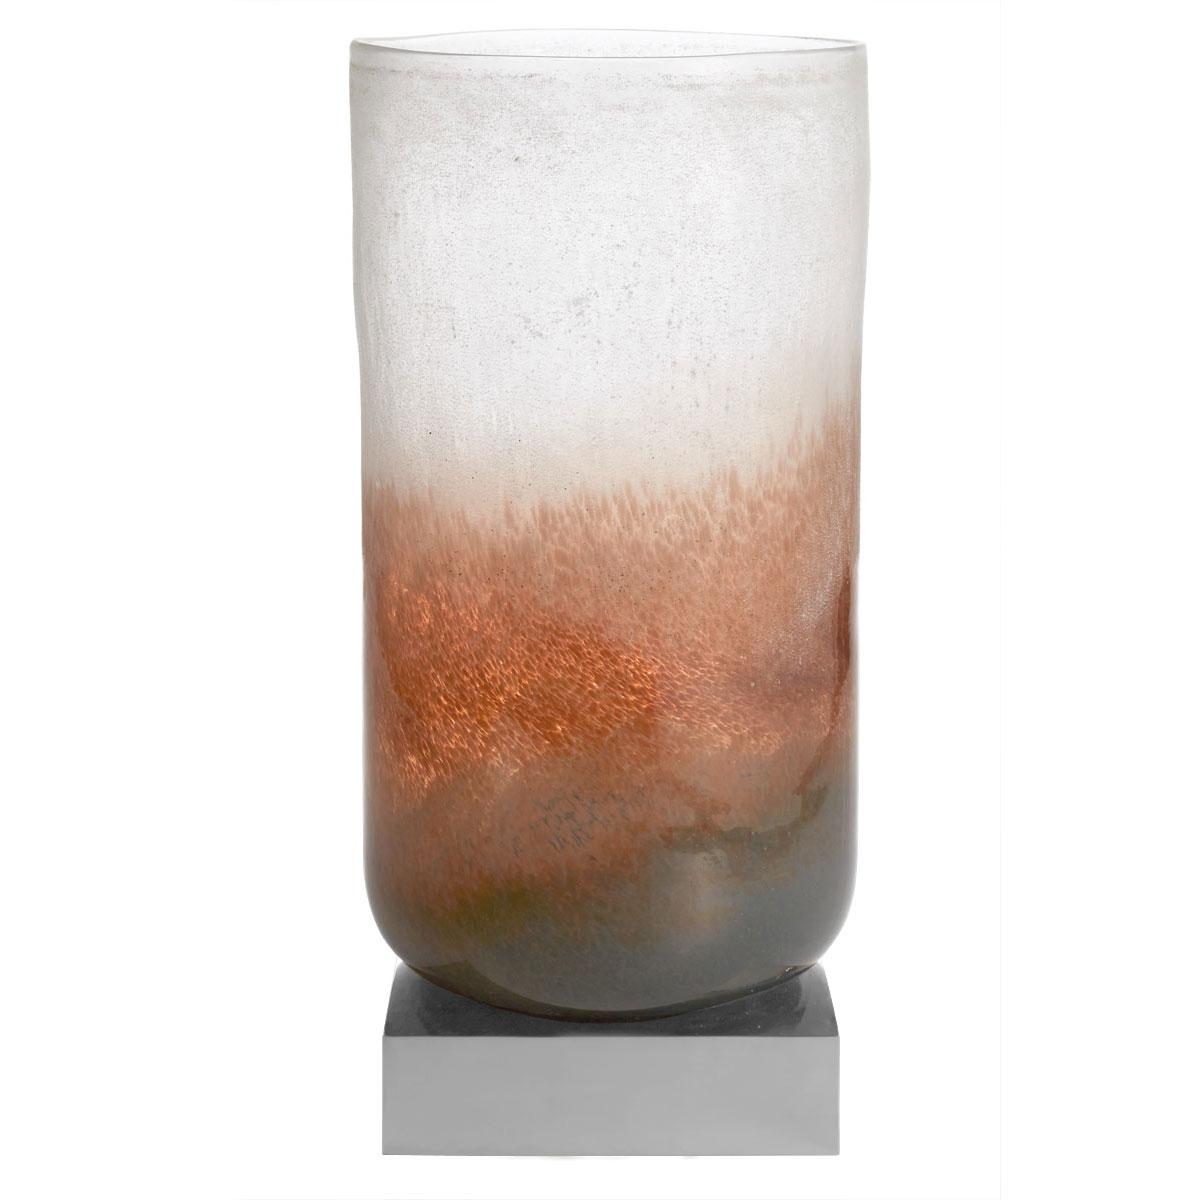 "Michael Aram Torched Glass 18"" Vase"